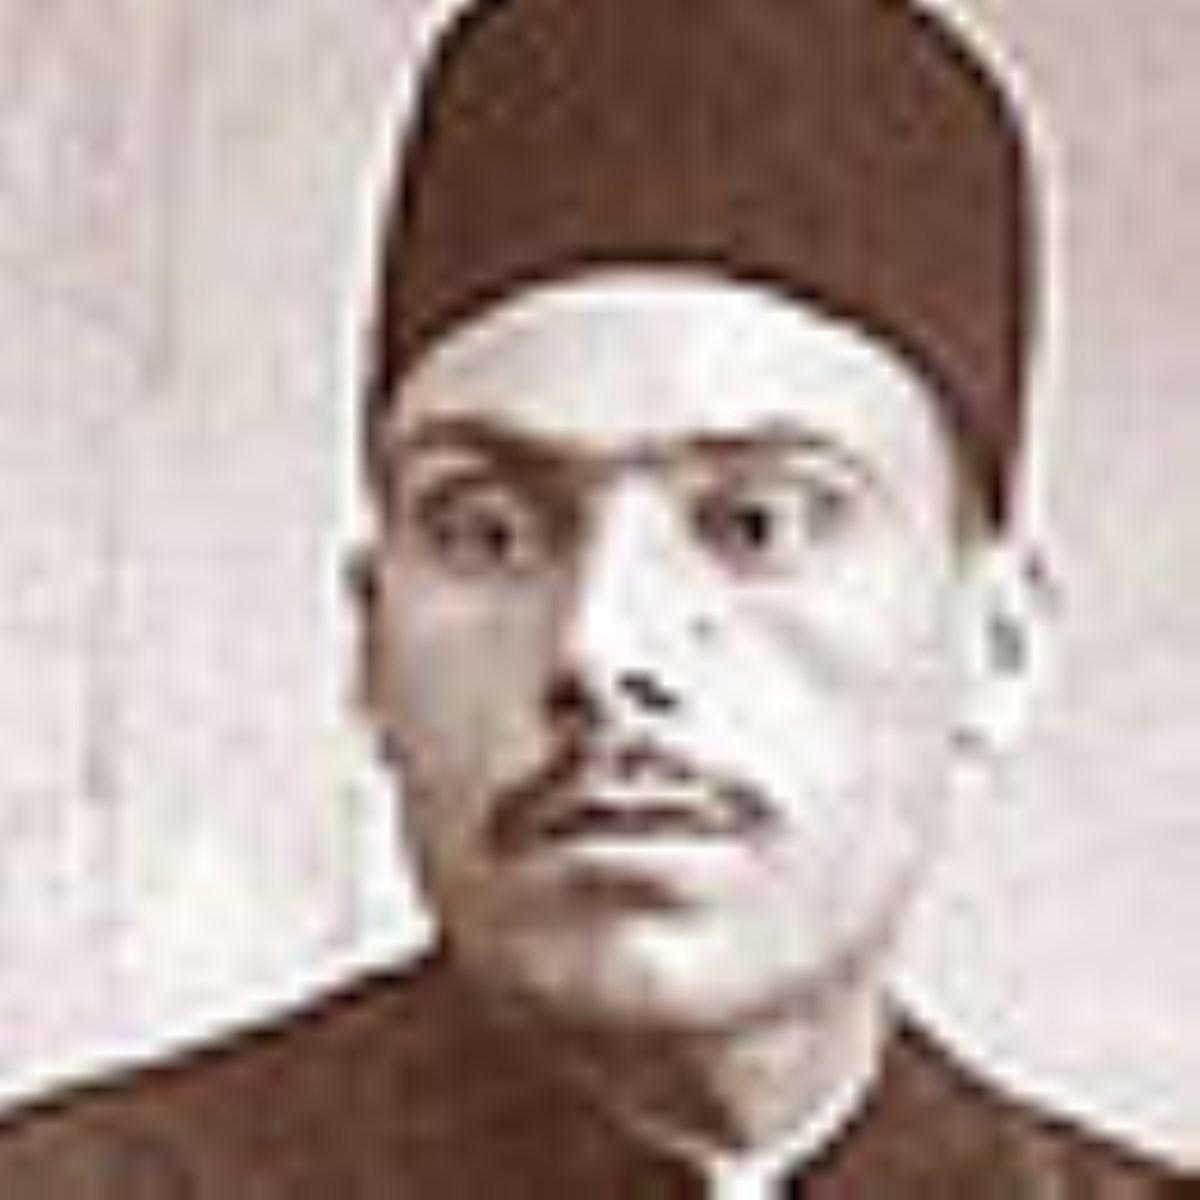 علي اصغر خان اتابک اعظم (امين السلطان)